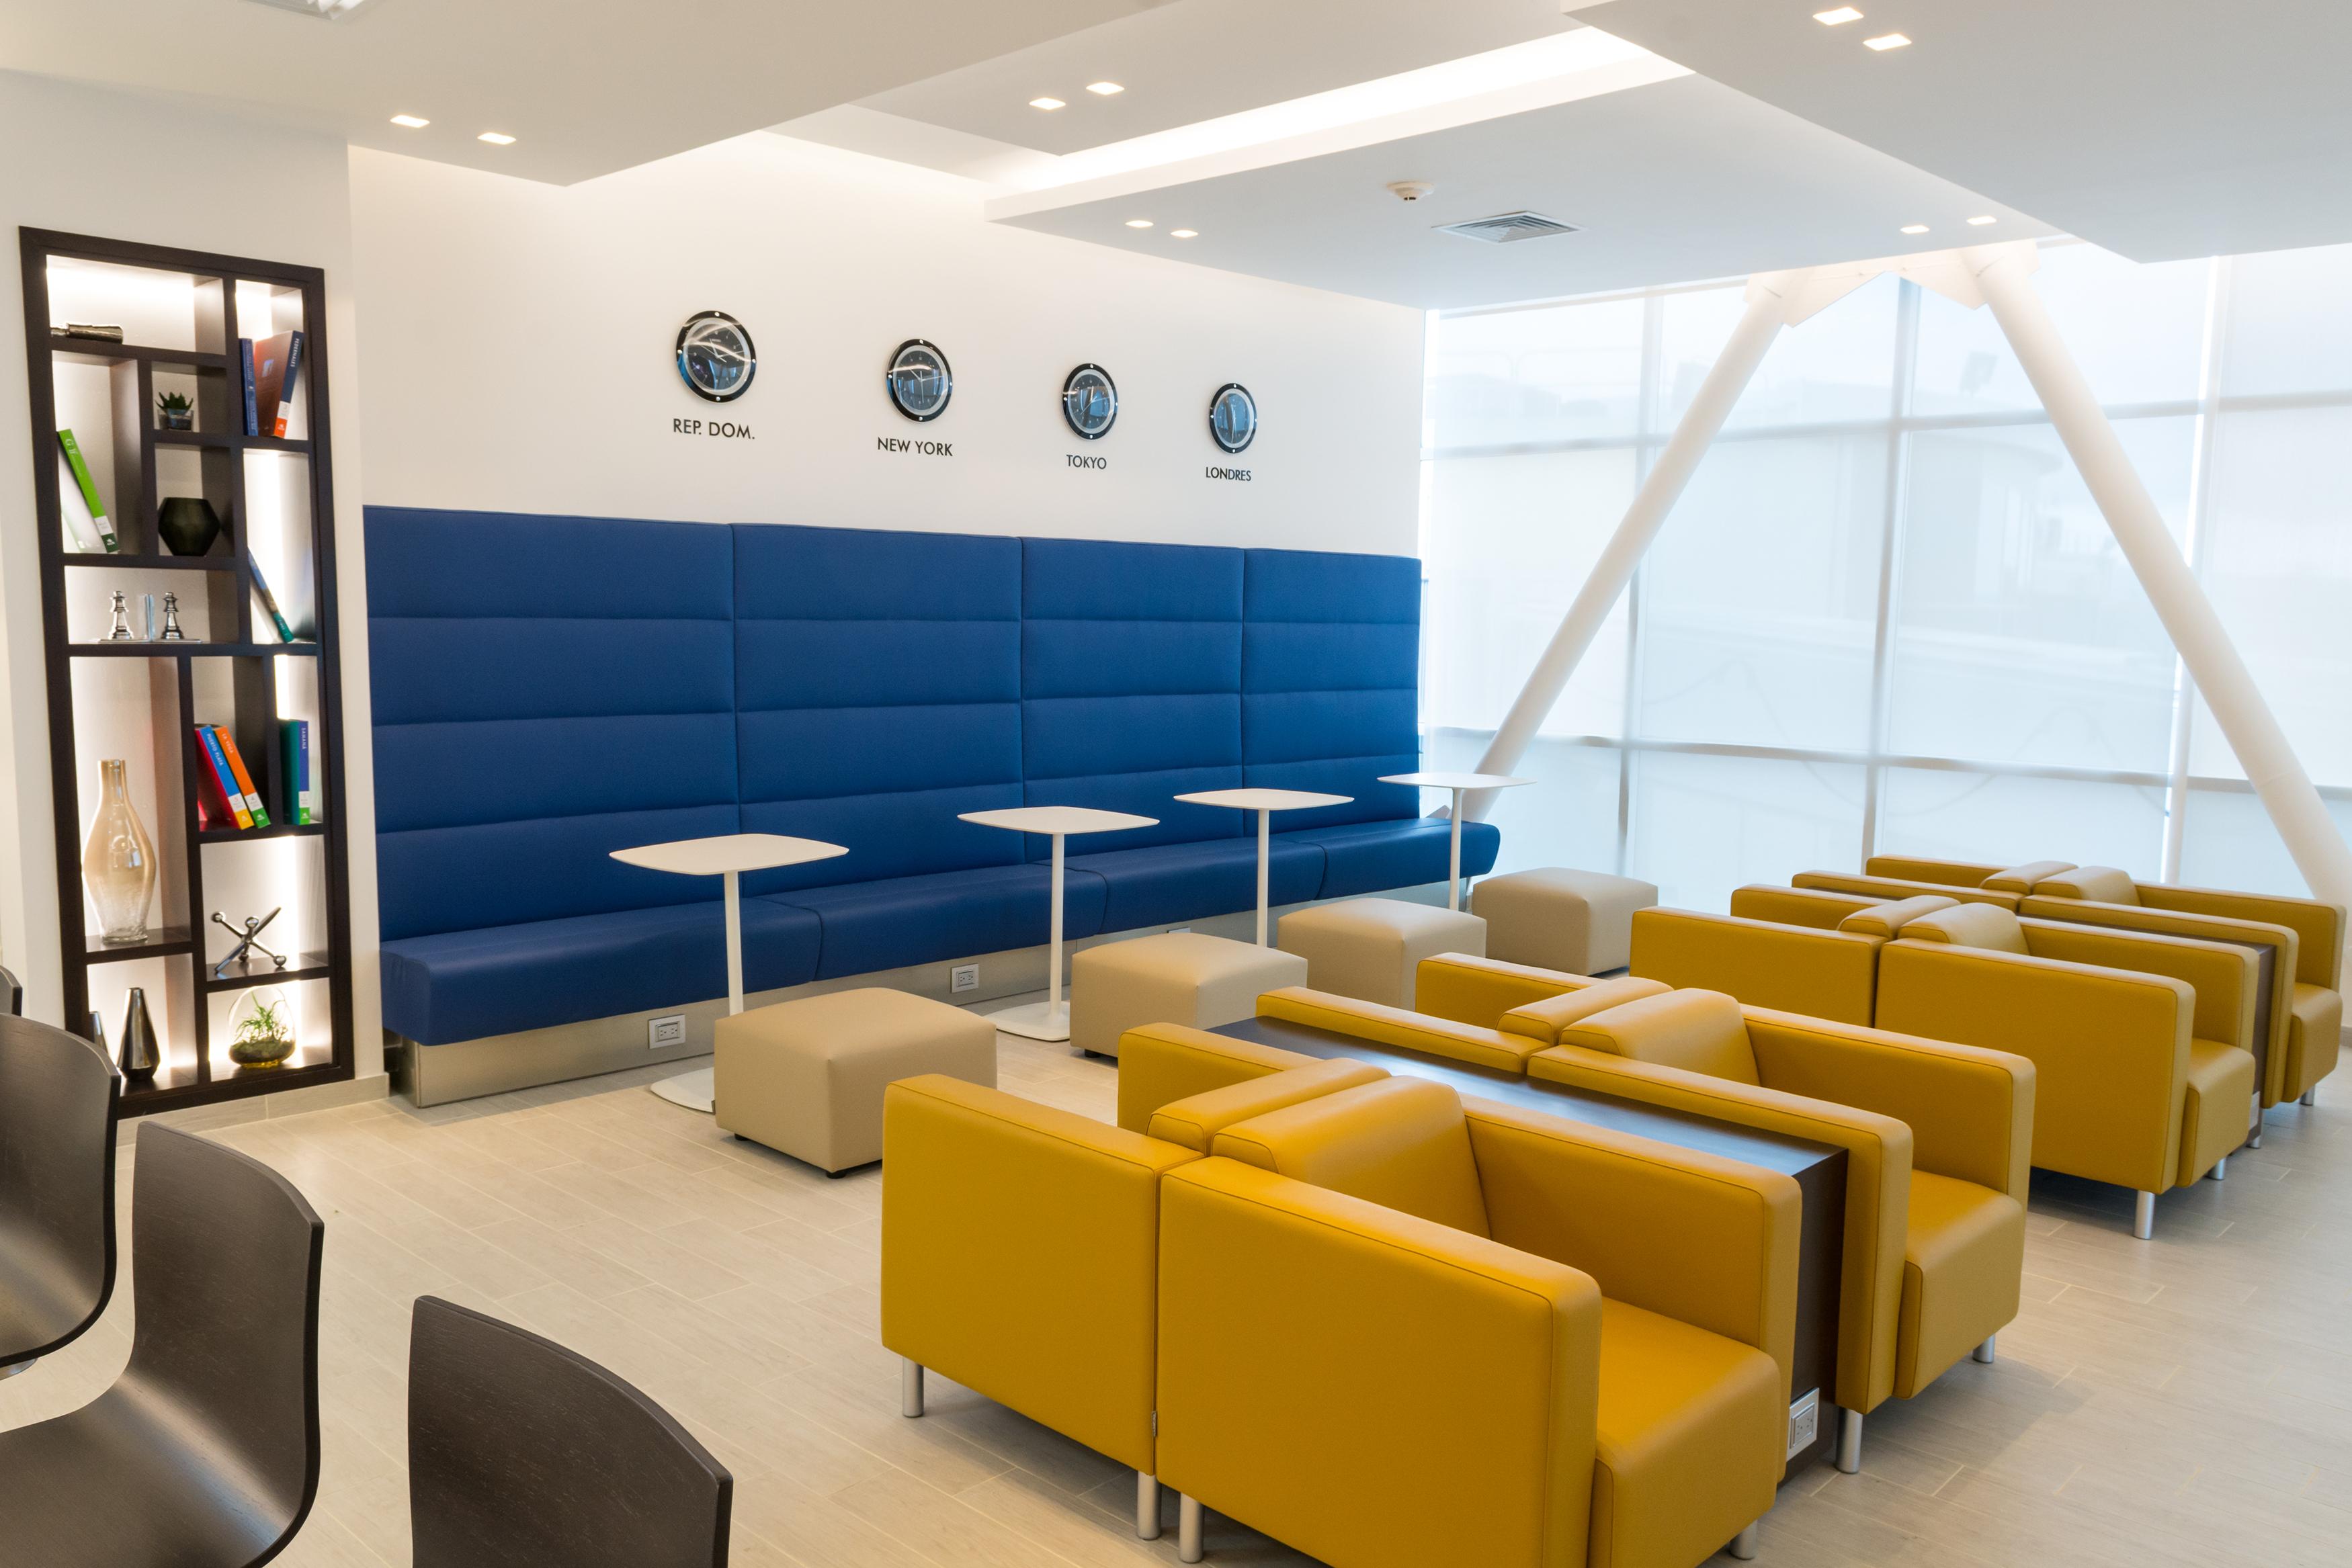 Tucci muebles exterior obtenga ideas dise o de muebles for Muebles de calidad